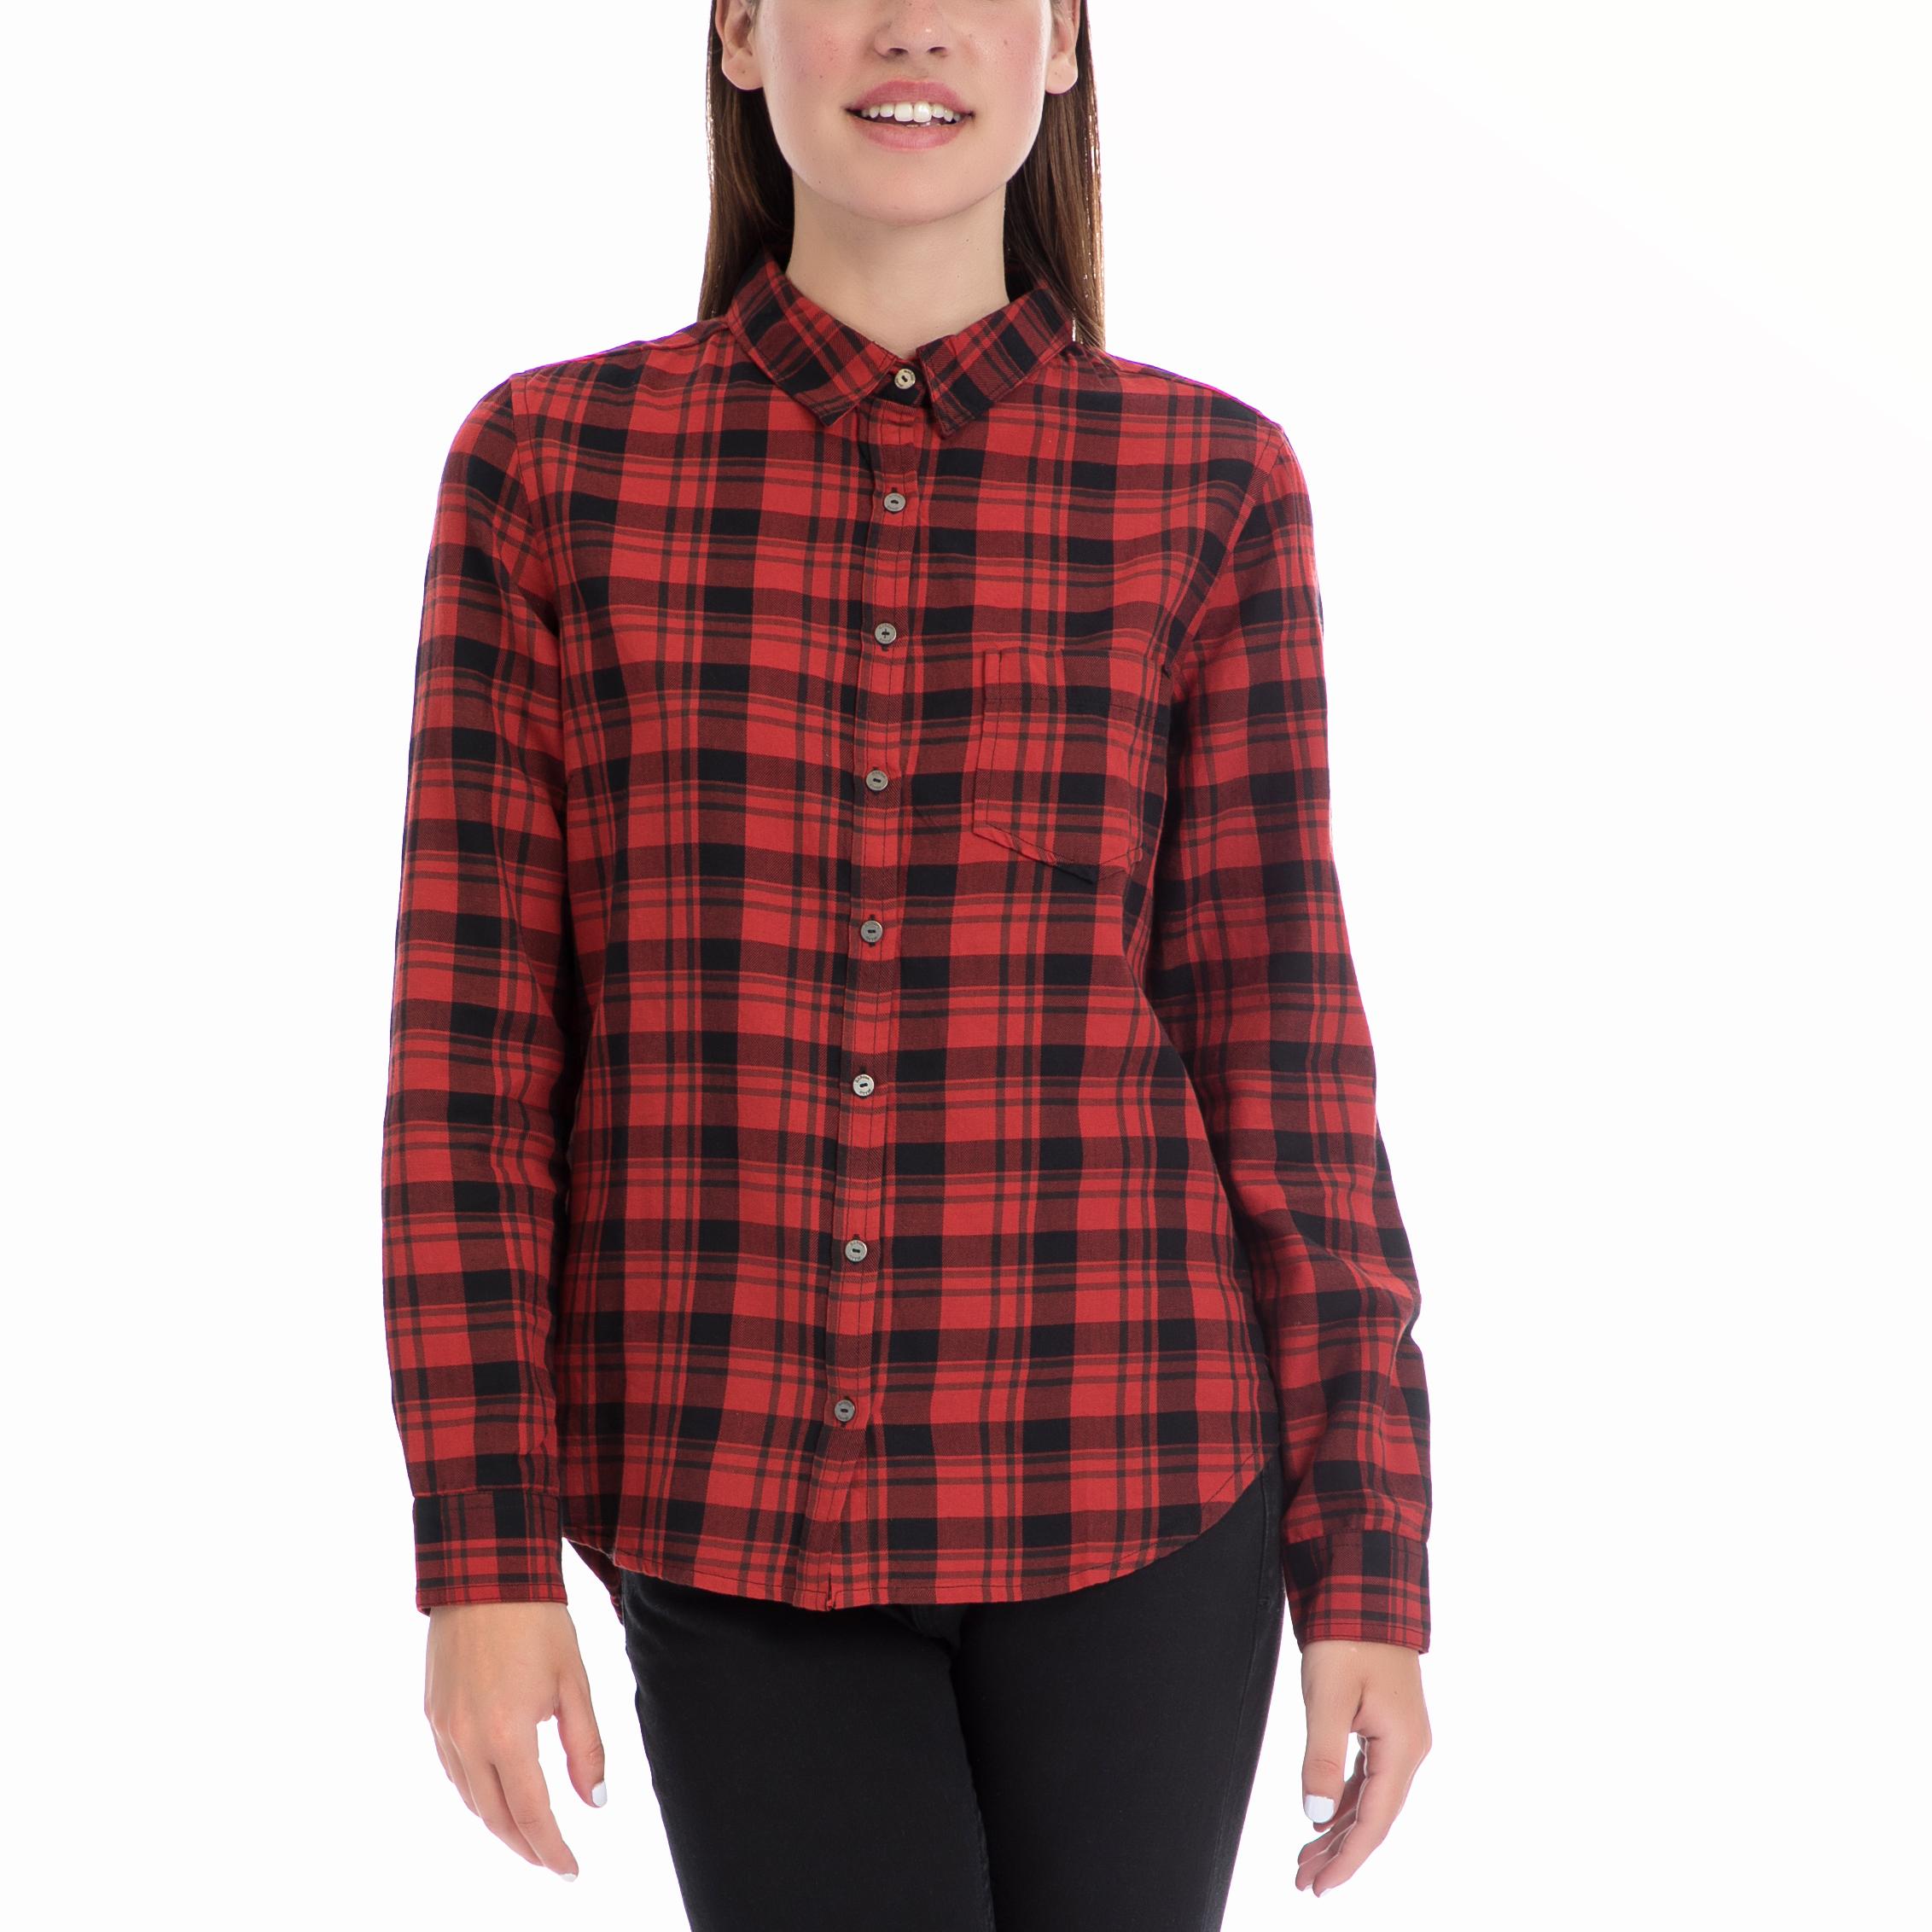 GARCIA JEANS - Γυναικείο πουκάμισο Garcia Jeans κόκκινο-μαύρο γυναικεία ρούχα πουκάμισα μακρυμάνικα